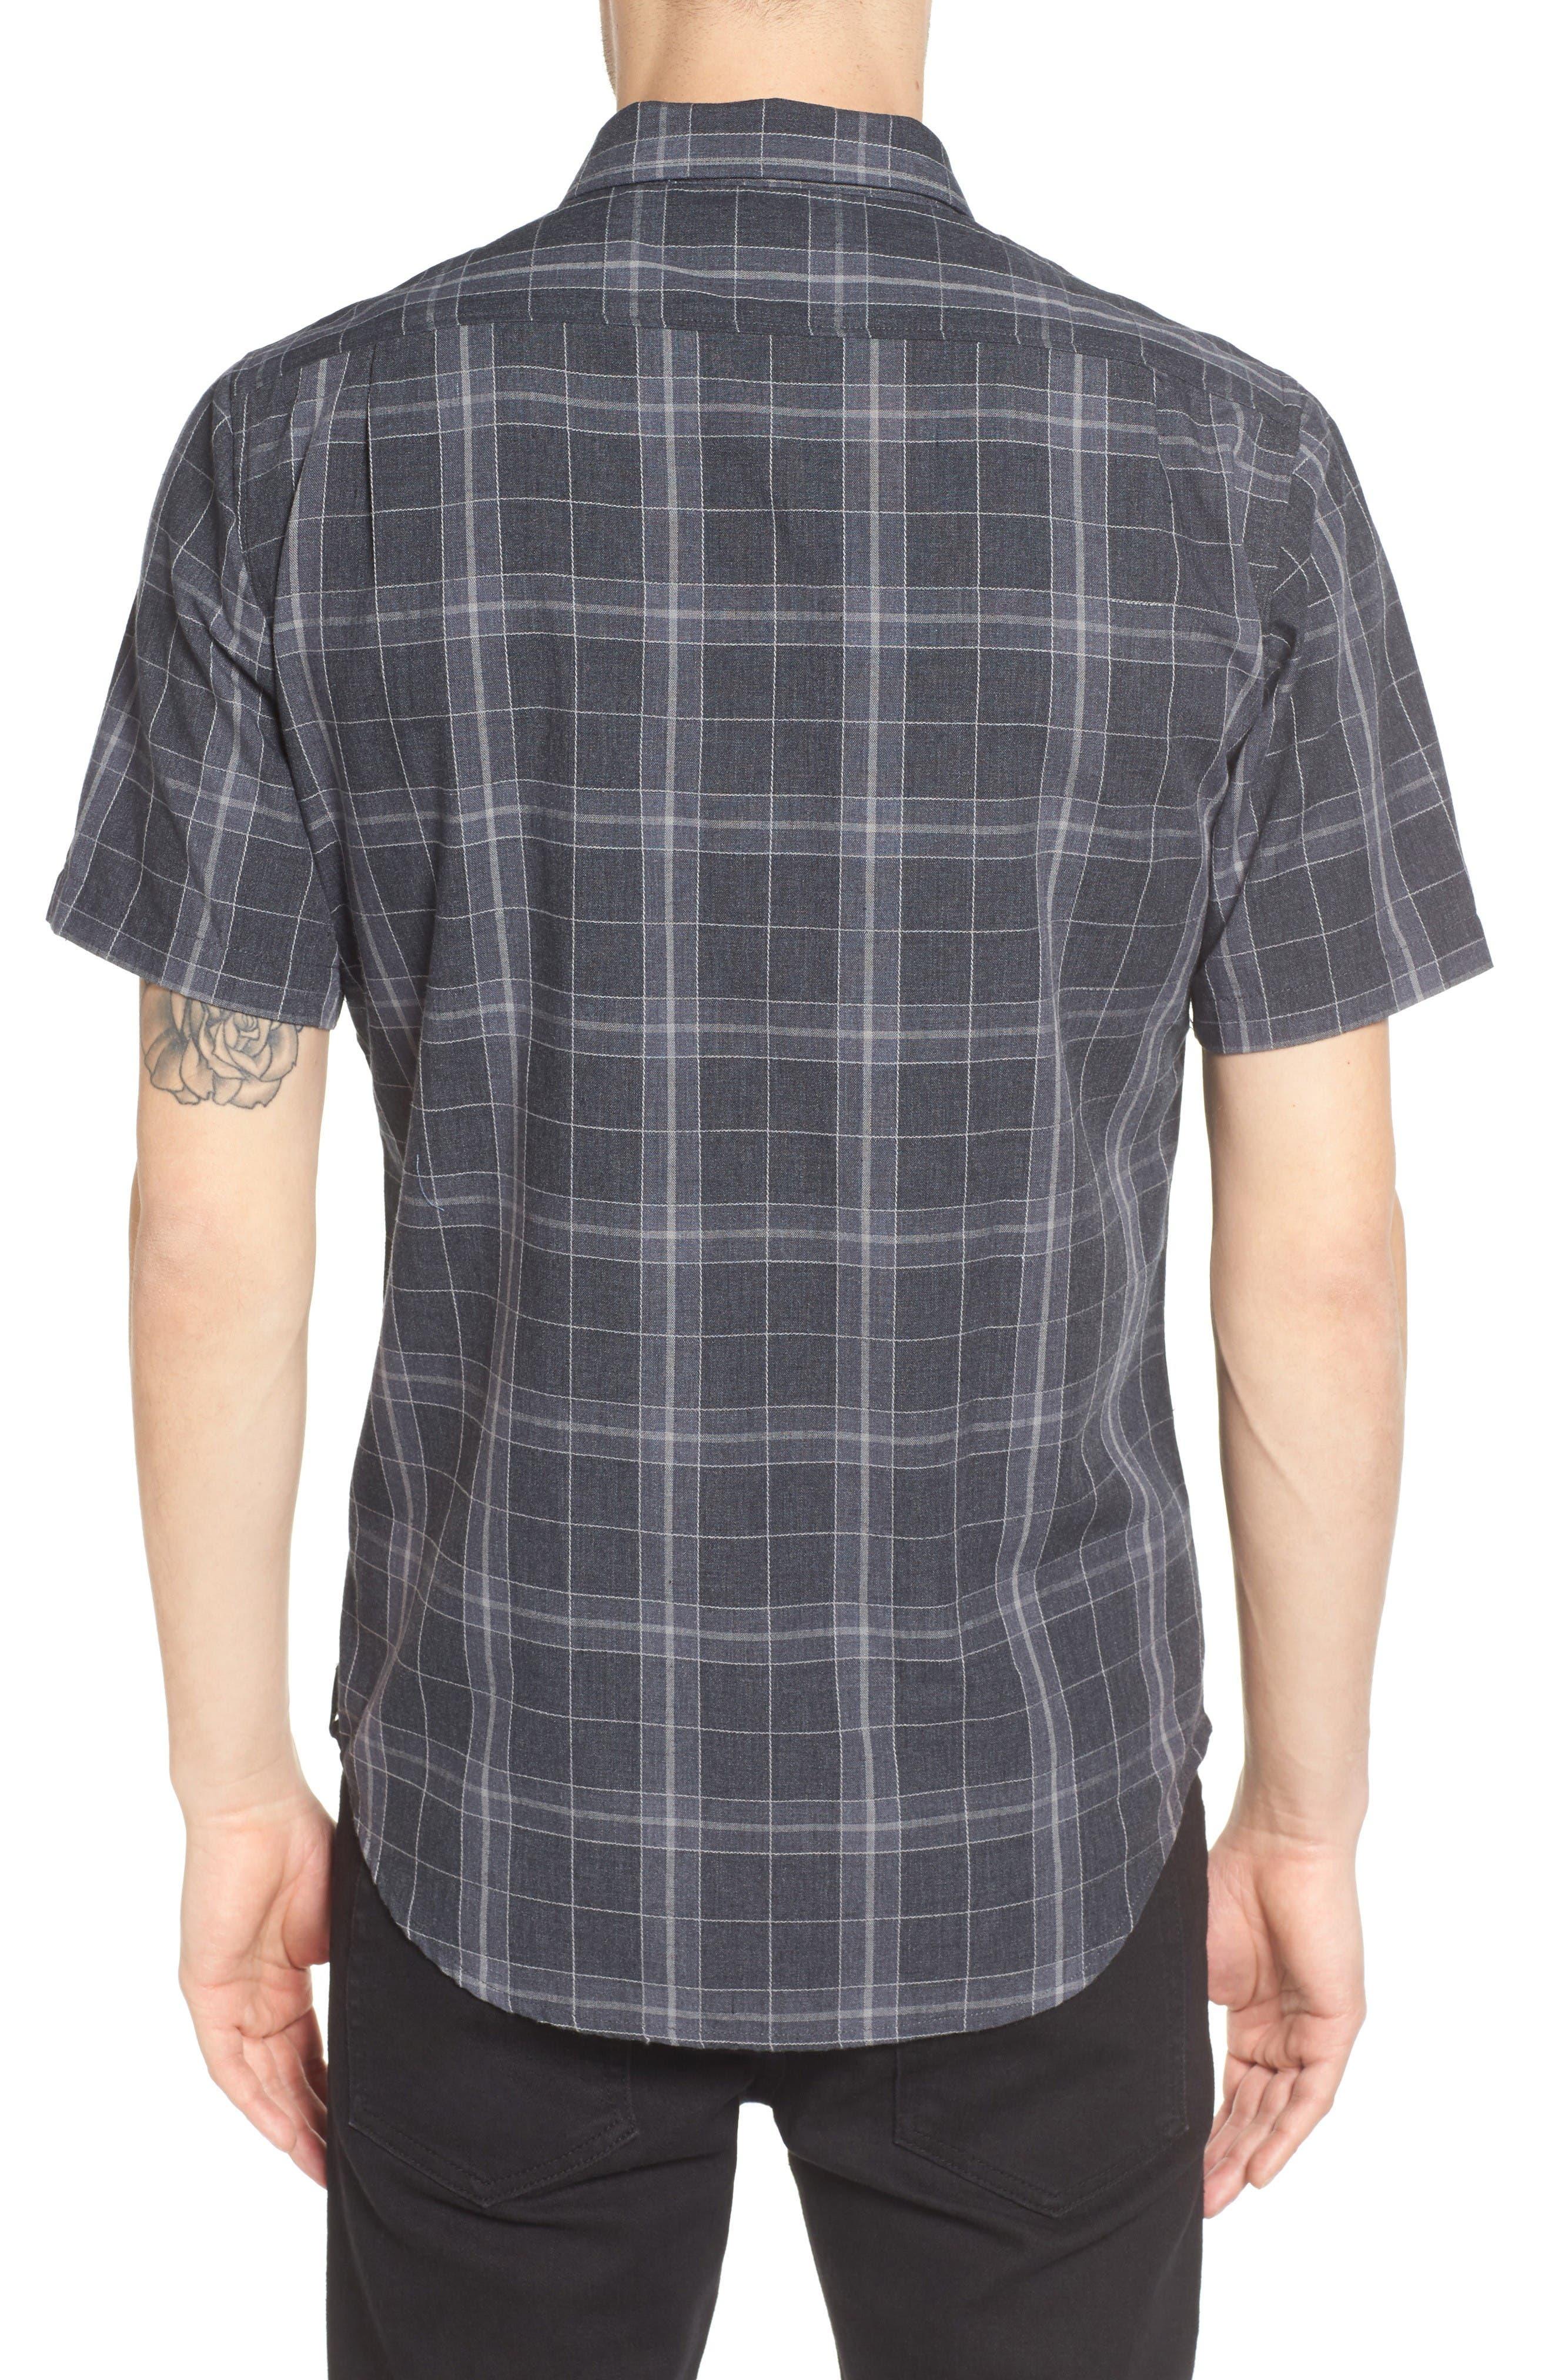 Alternate Image 2  - Ezekiel Plaid Woven Shirt